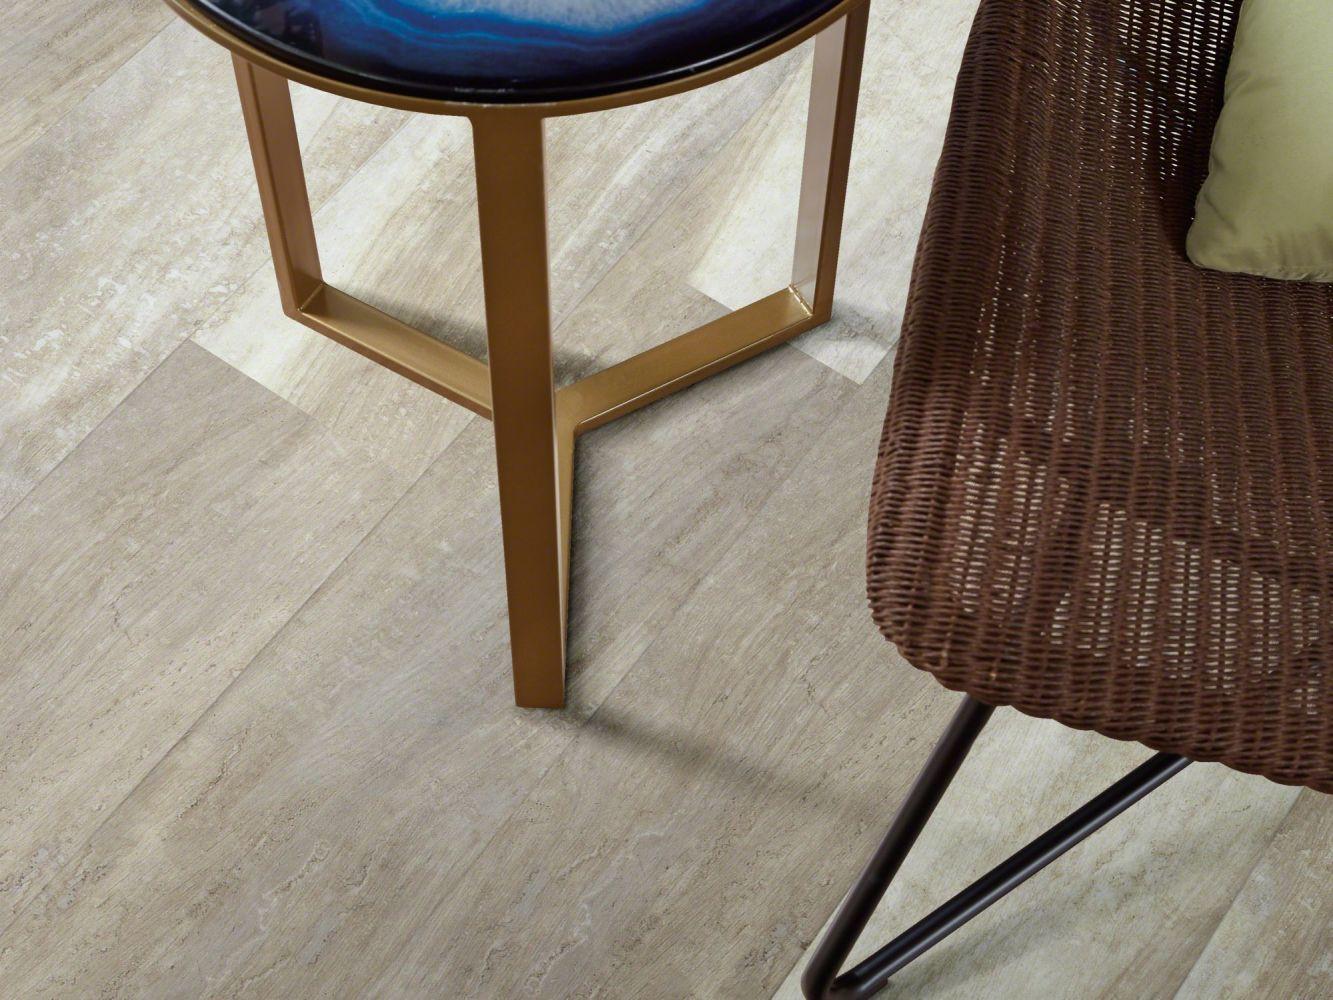 Shaw Floors Nfa HS Ventura Alabaster Oak 00117_VH542